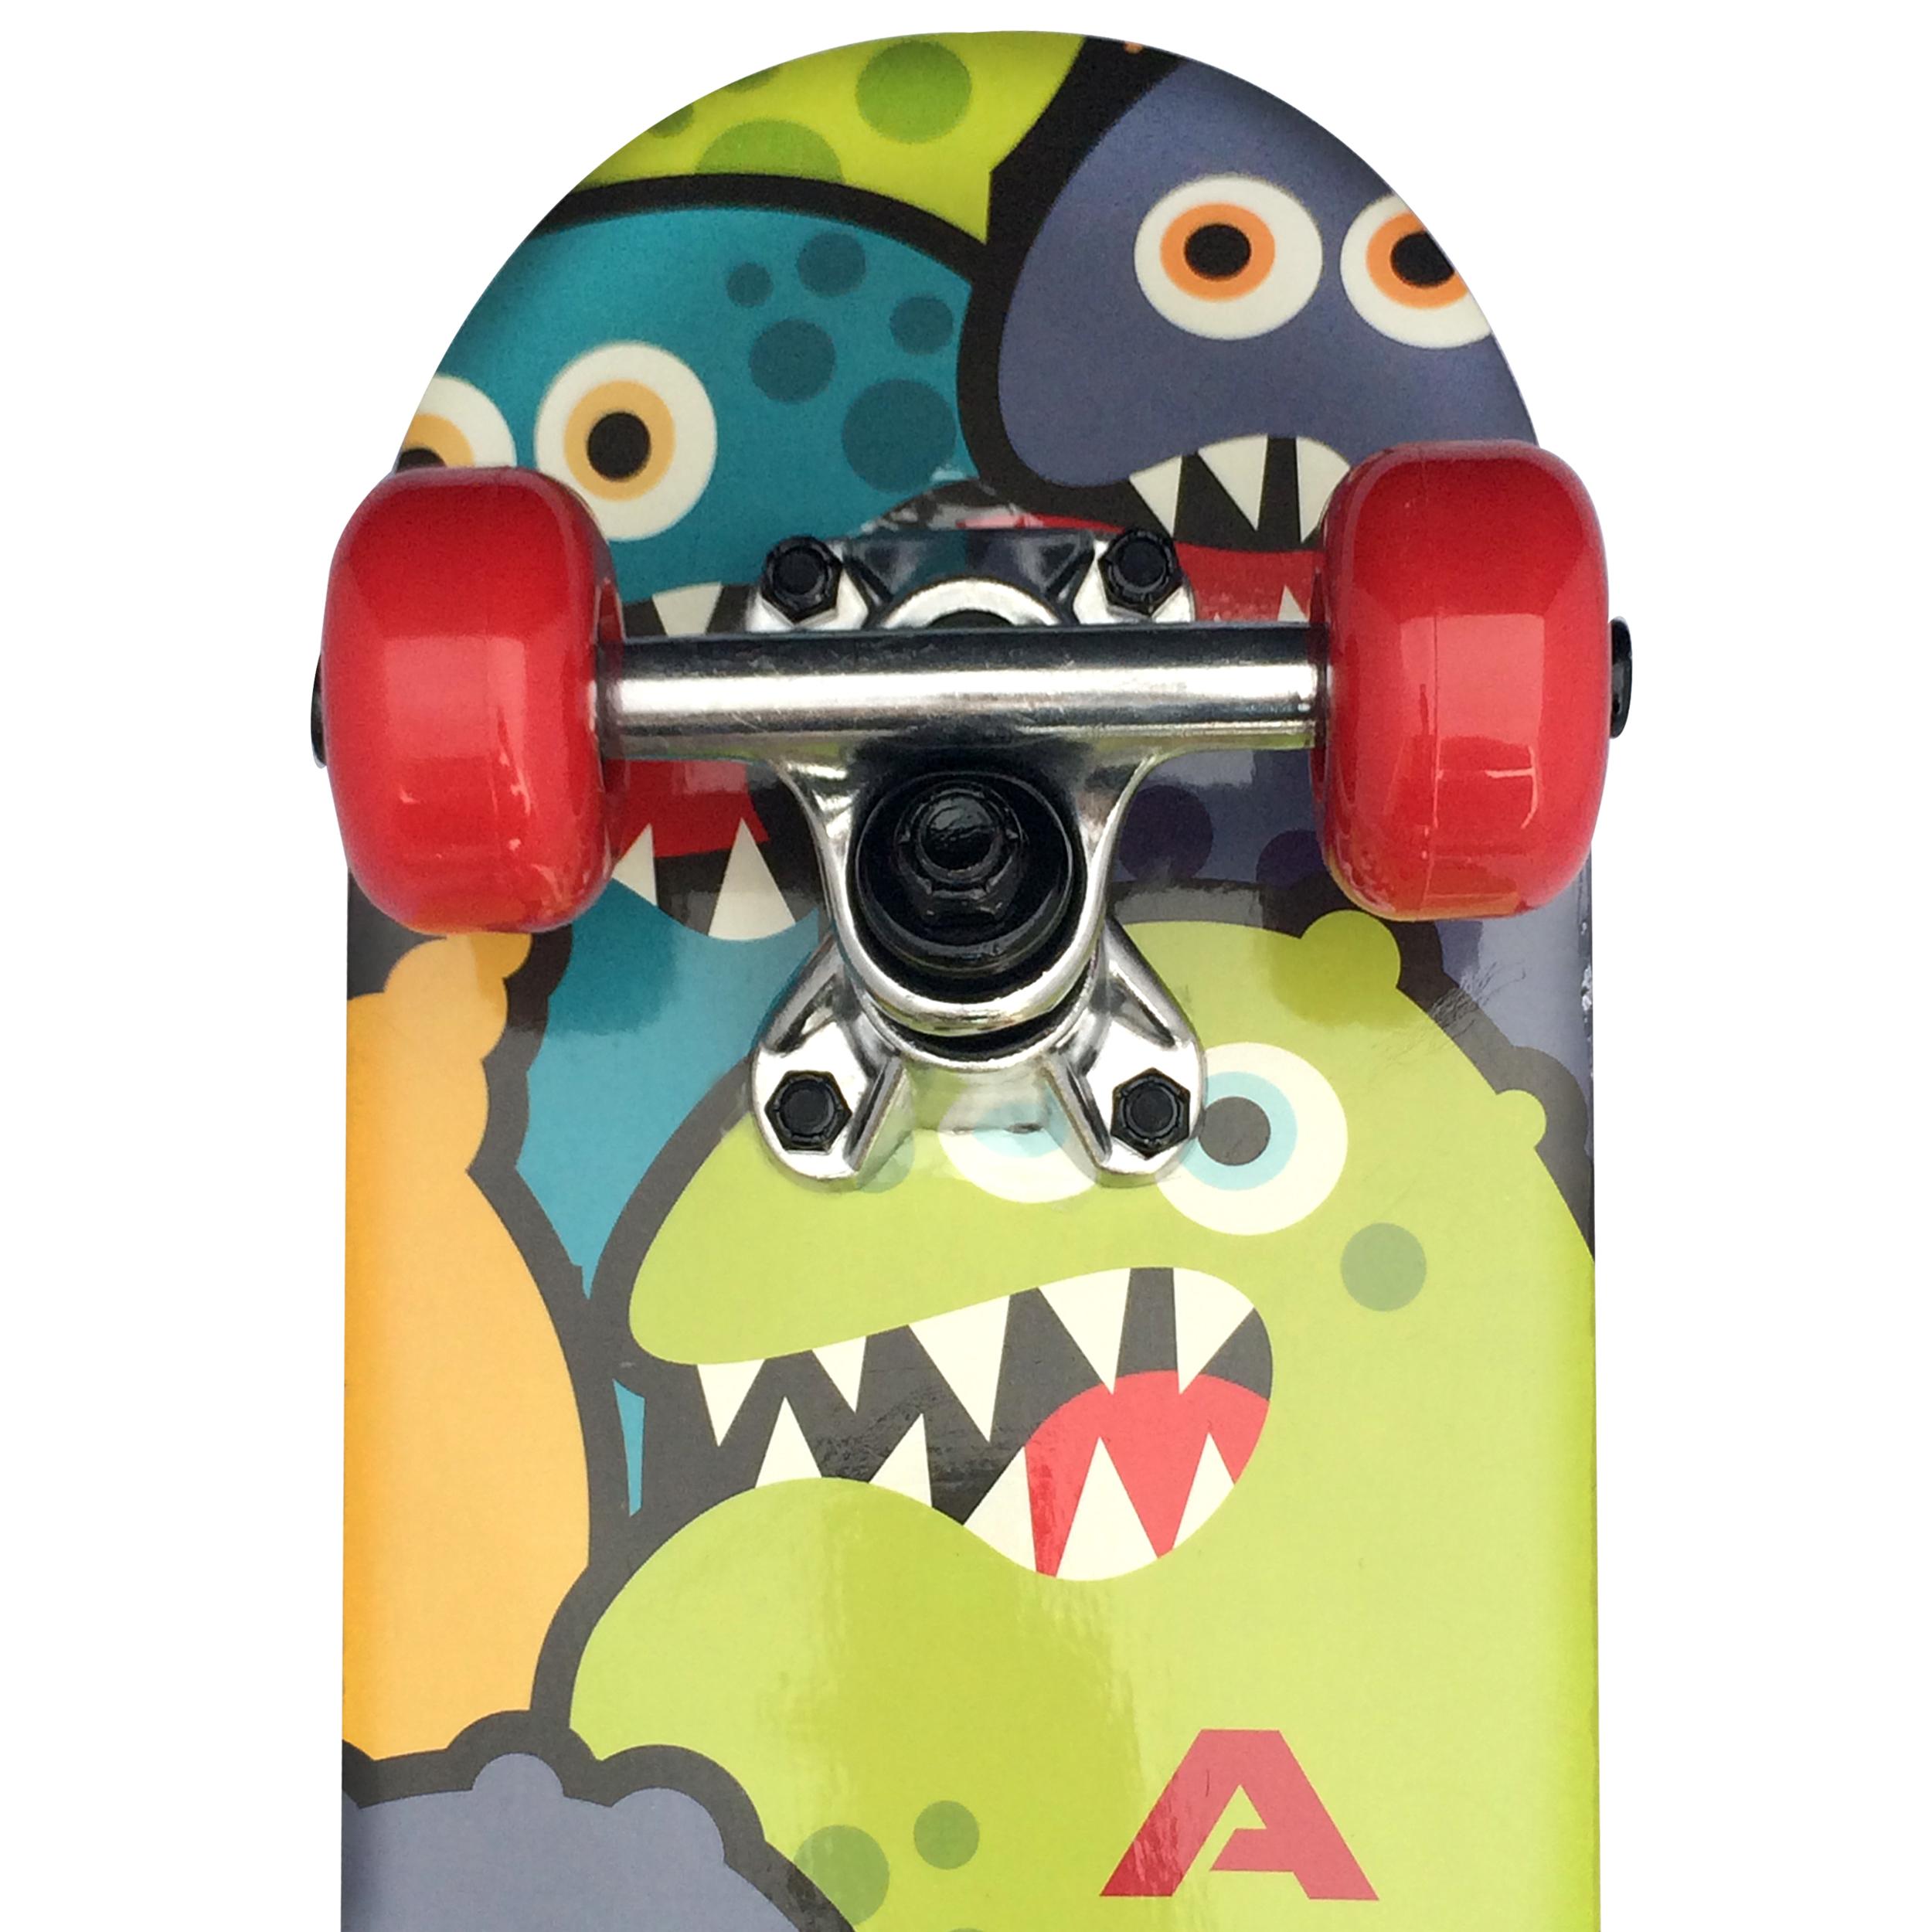 apollo skateboard monsterskate kinderskateboard 51cm. Black Bedroom Furniture Sets. Home Design Ideas